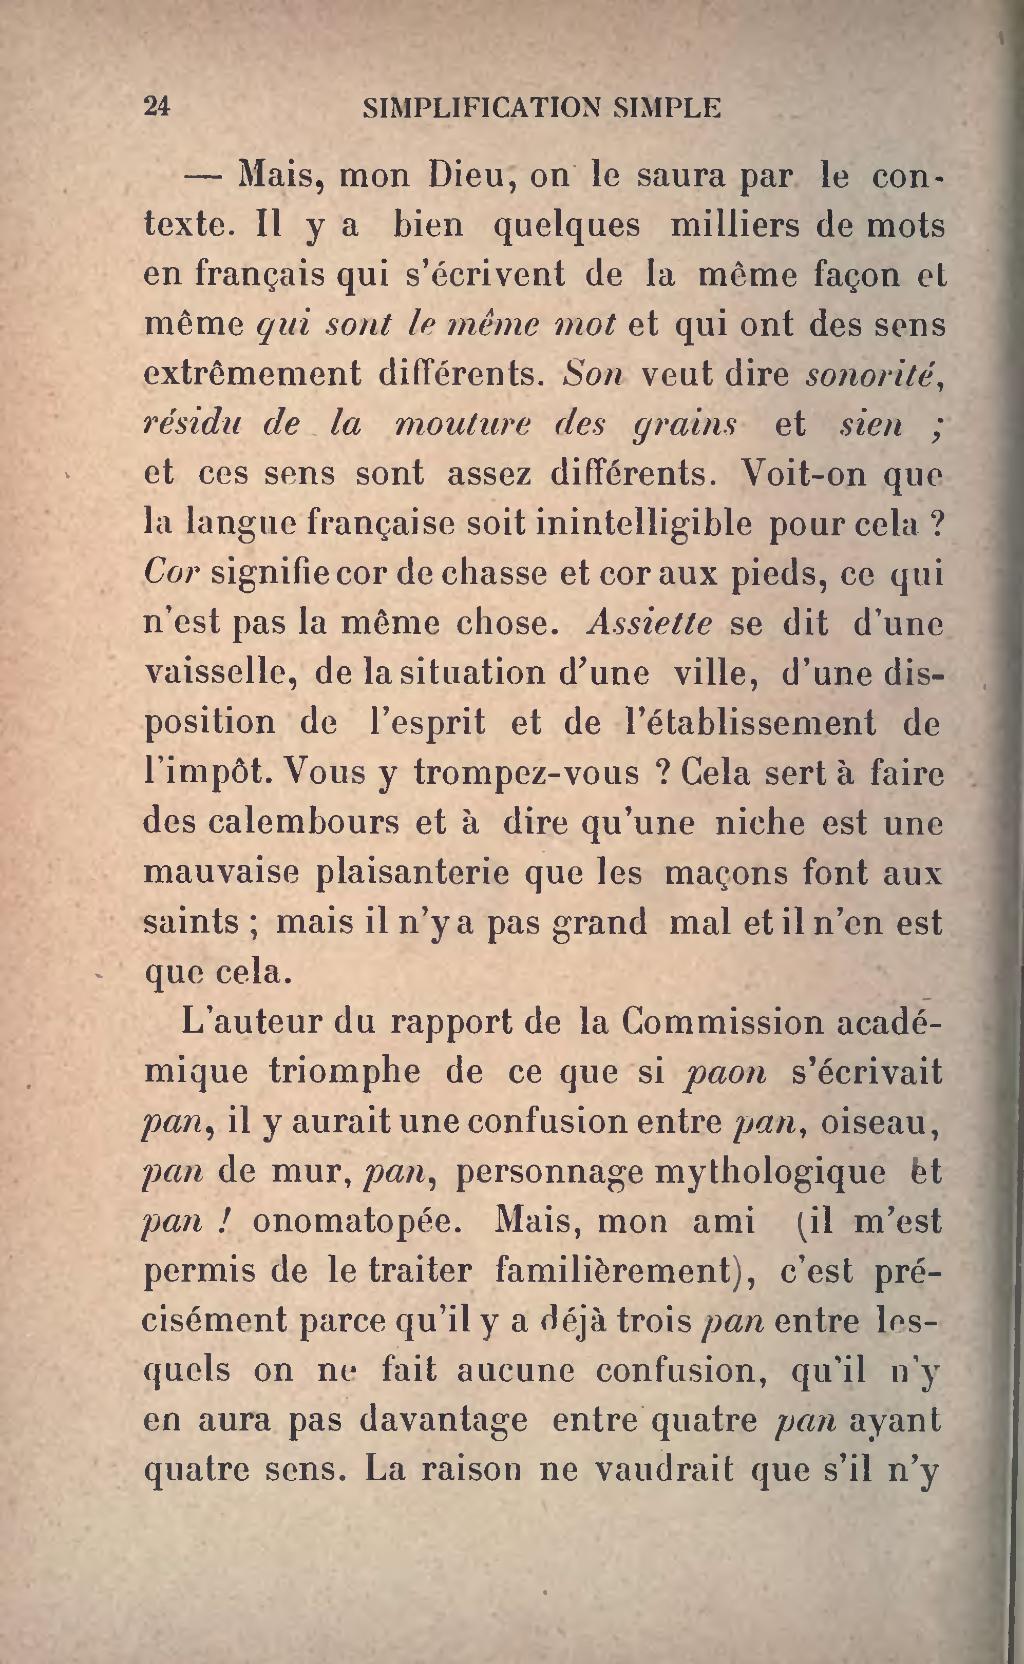 Y Aurait-il Orthographe : aurait-il, orthographe, Page:Faguet, Simplification, Simple, L'orthographe,, 1905.djvu/30, Wikisource